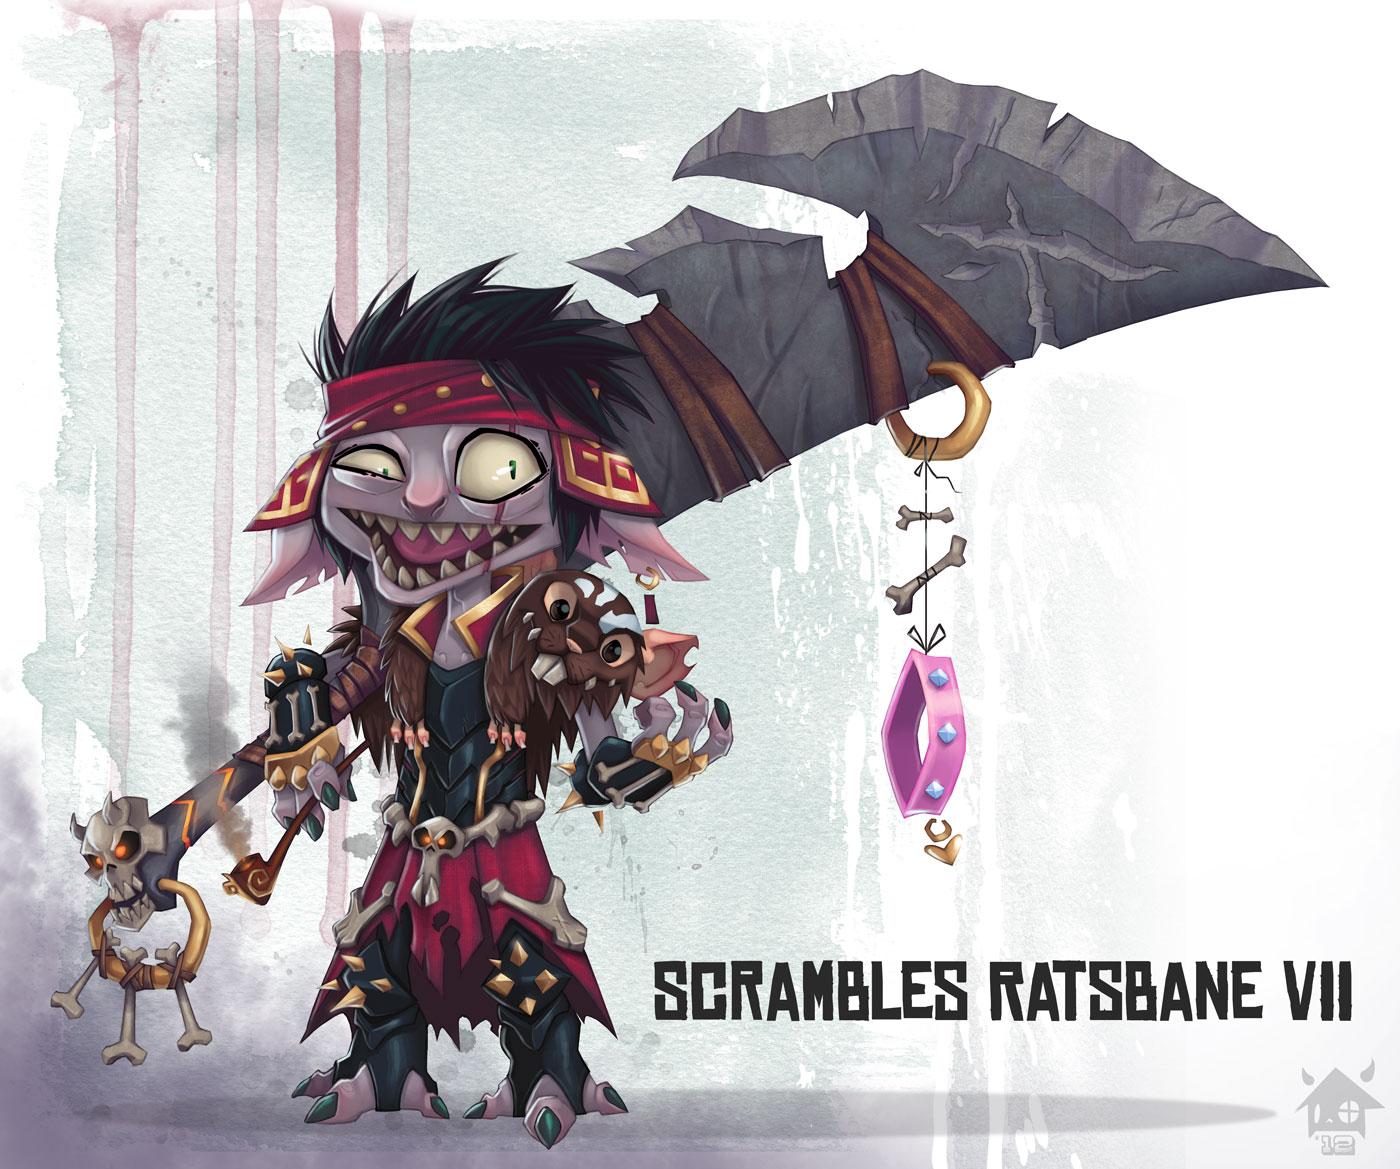 Scrambles Ratsbane VII by GhostHause